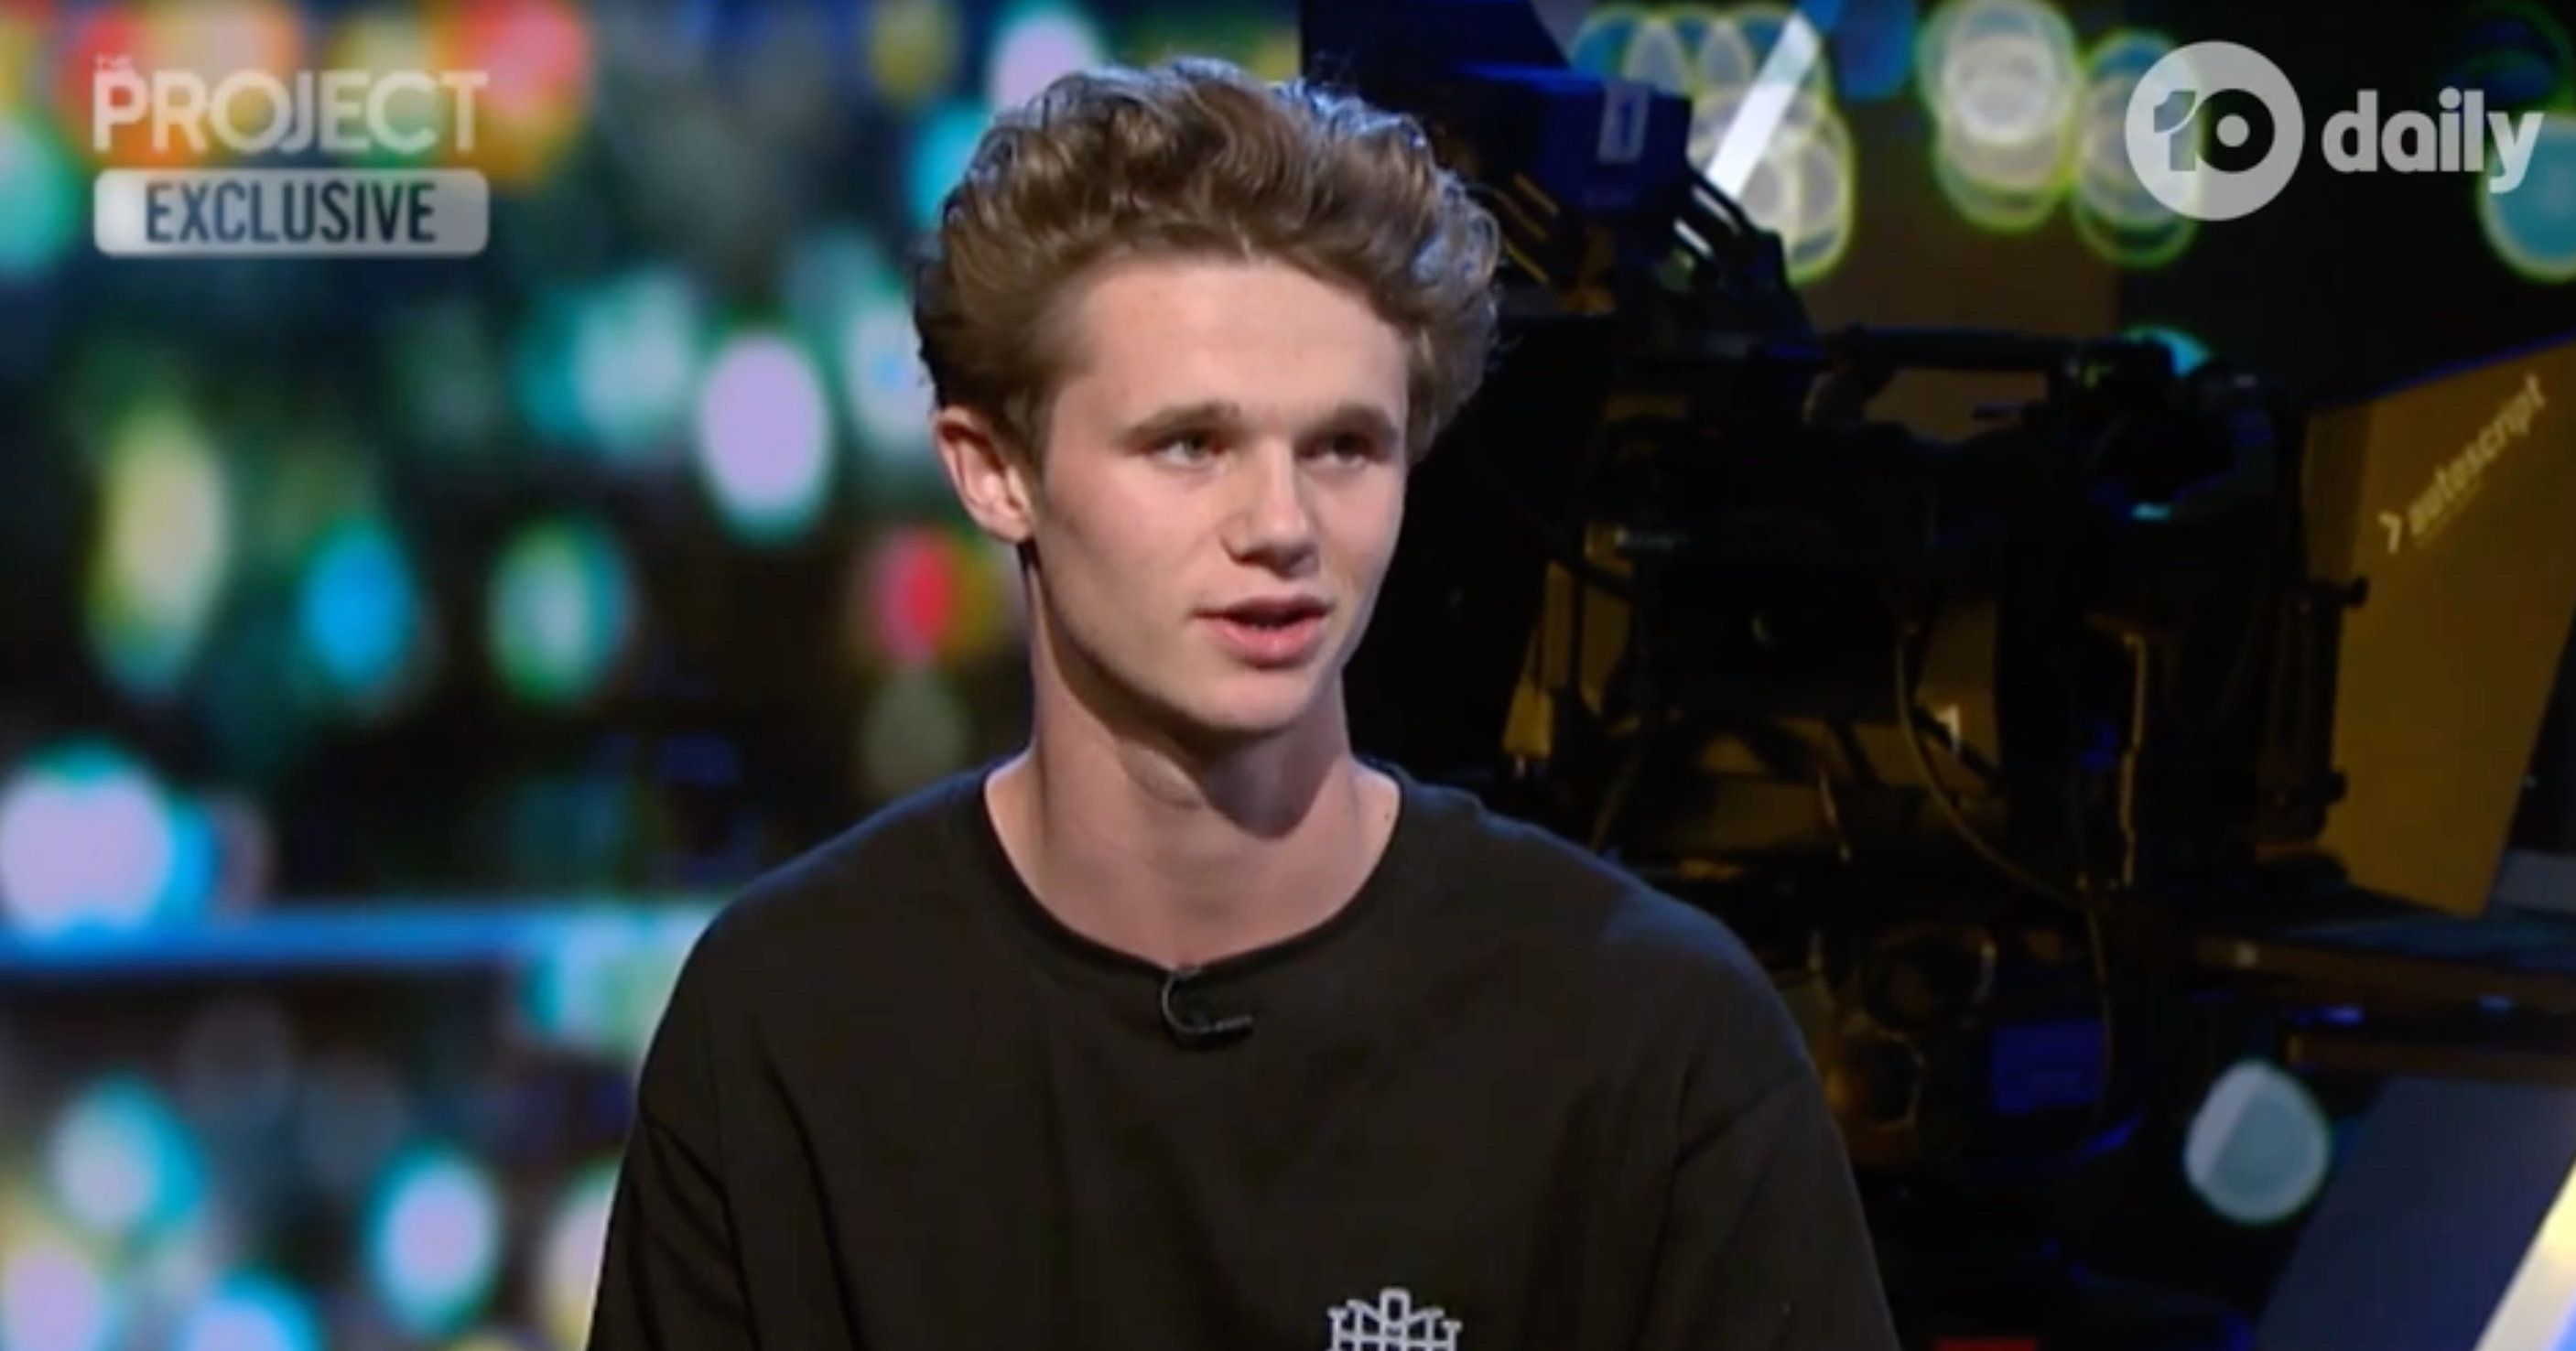 Teen Who Egged Australian Senator Breaks Silence: 'This Egg Has United People'